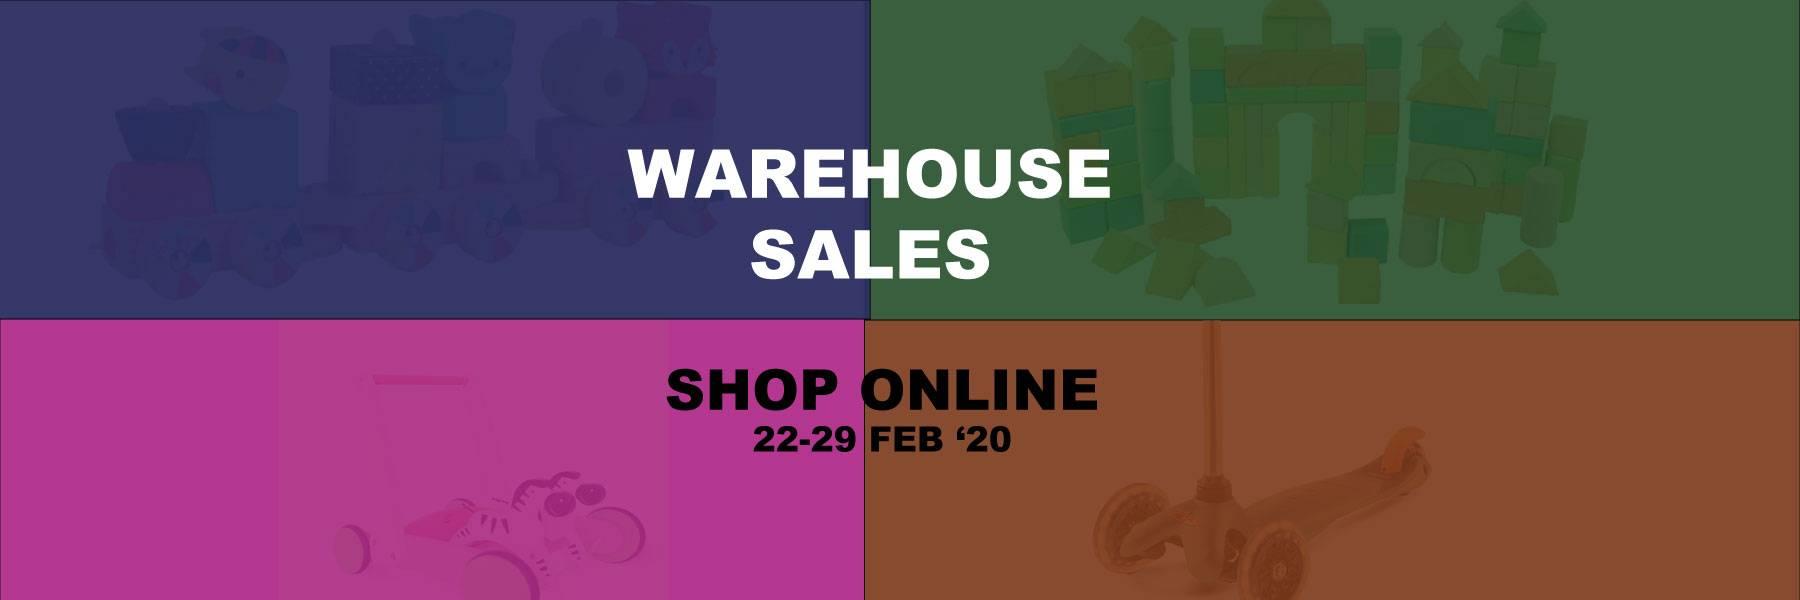 Warehouse Sales